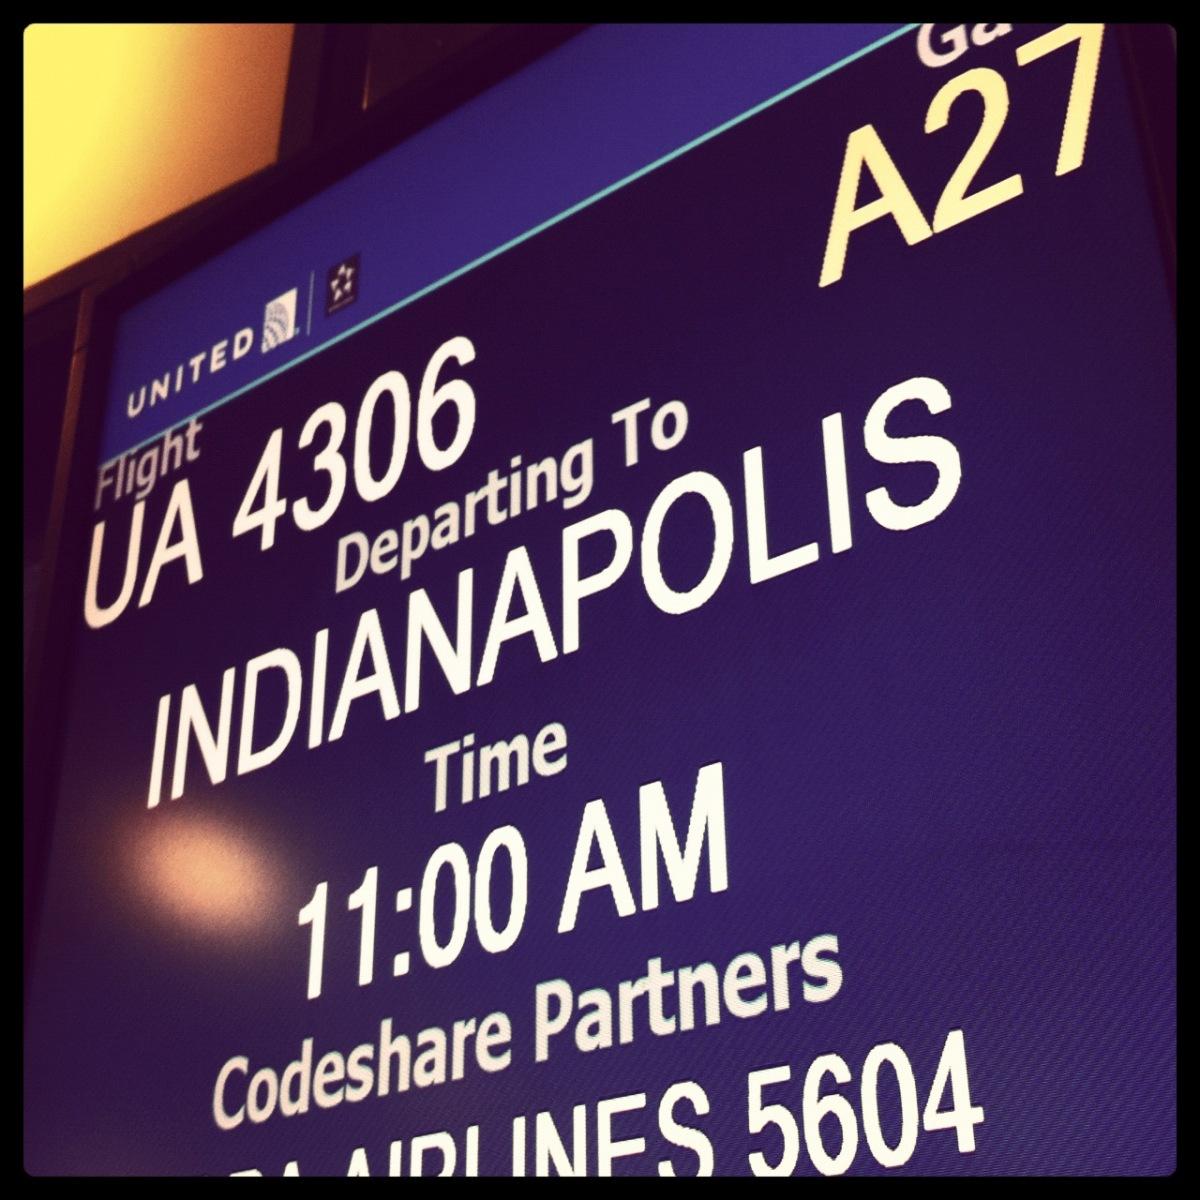 My flight to Indy